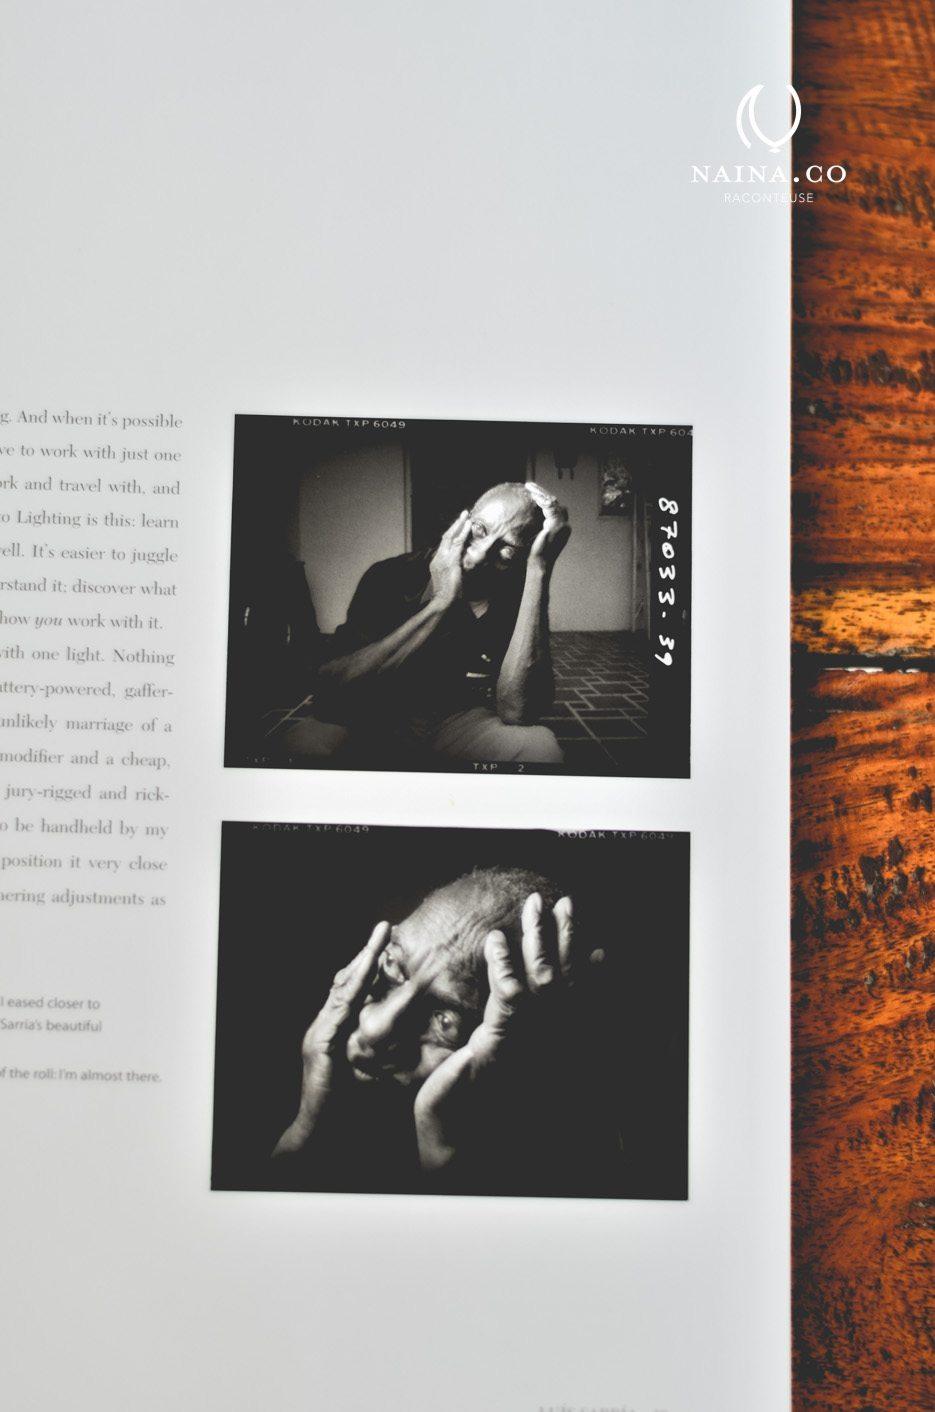 Gregory-Heisler-50-Portraits-Photographer-Book-Naina.co-Raconteuse-Visual-Storyteller